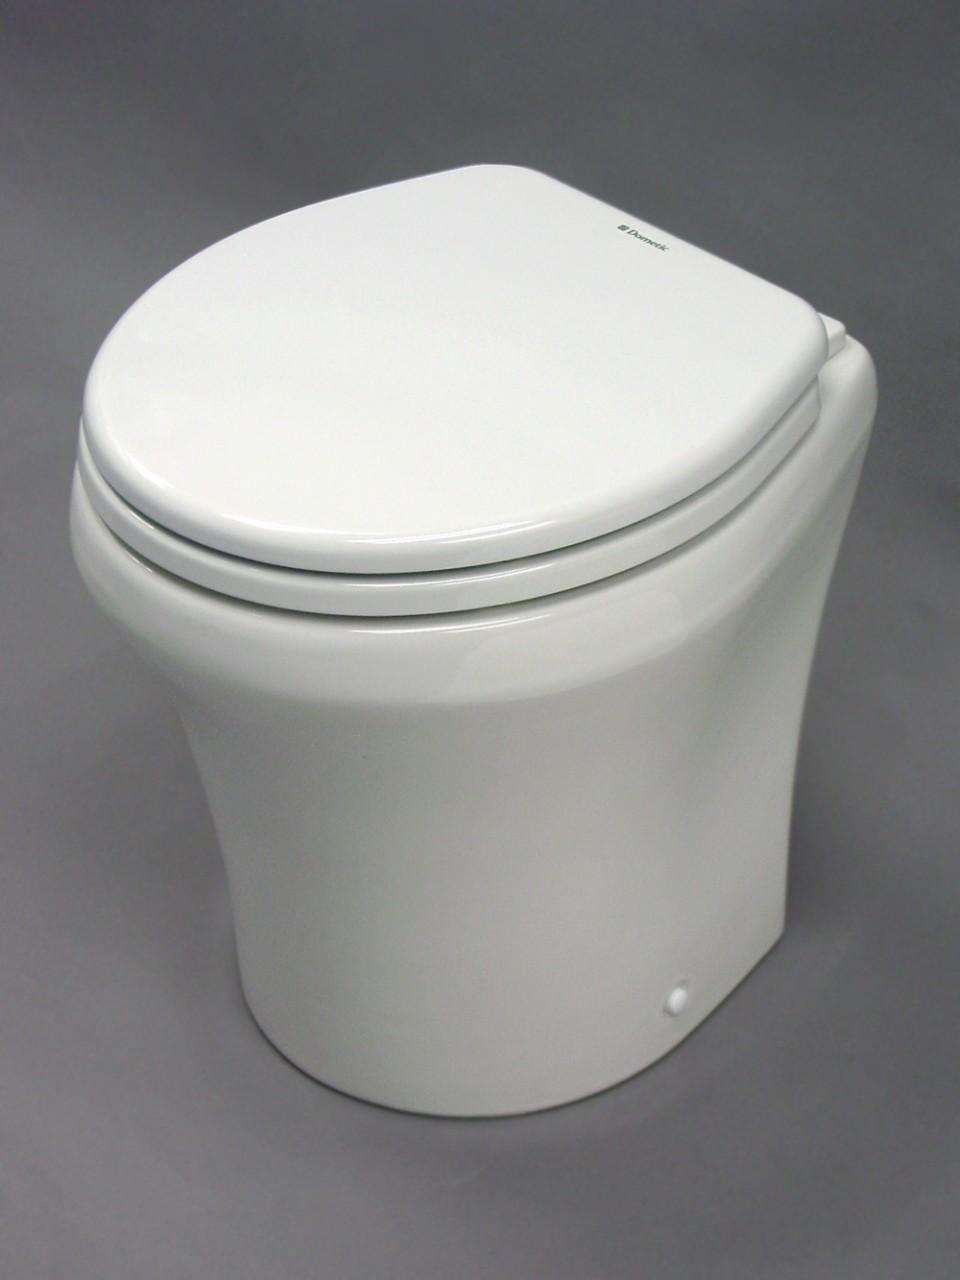 Sealand / Dometic 304811201 MasterFlush Macerator Marine Toilet 8112 ...